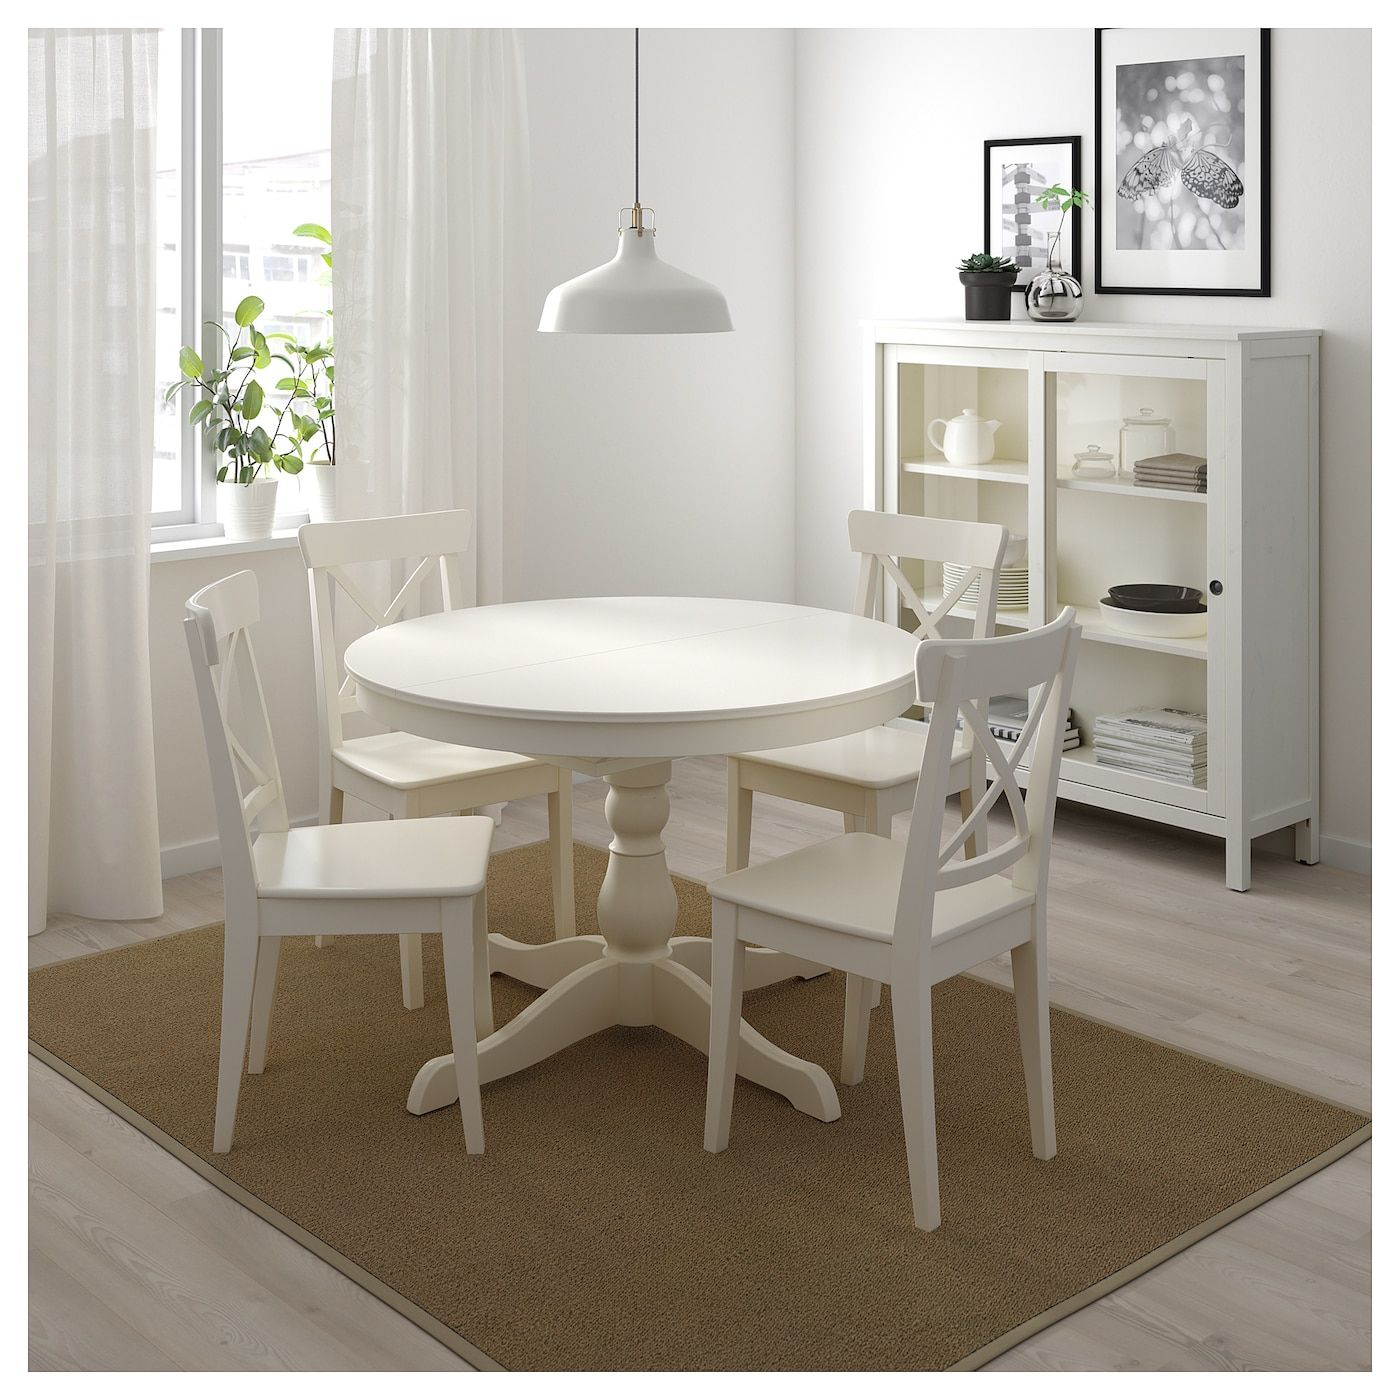 Ingatorp Extendable Table White Shop Ikea Ca Ikea Petite Table Cuisine Table A Rallonge Petite Salle A Manger